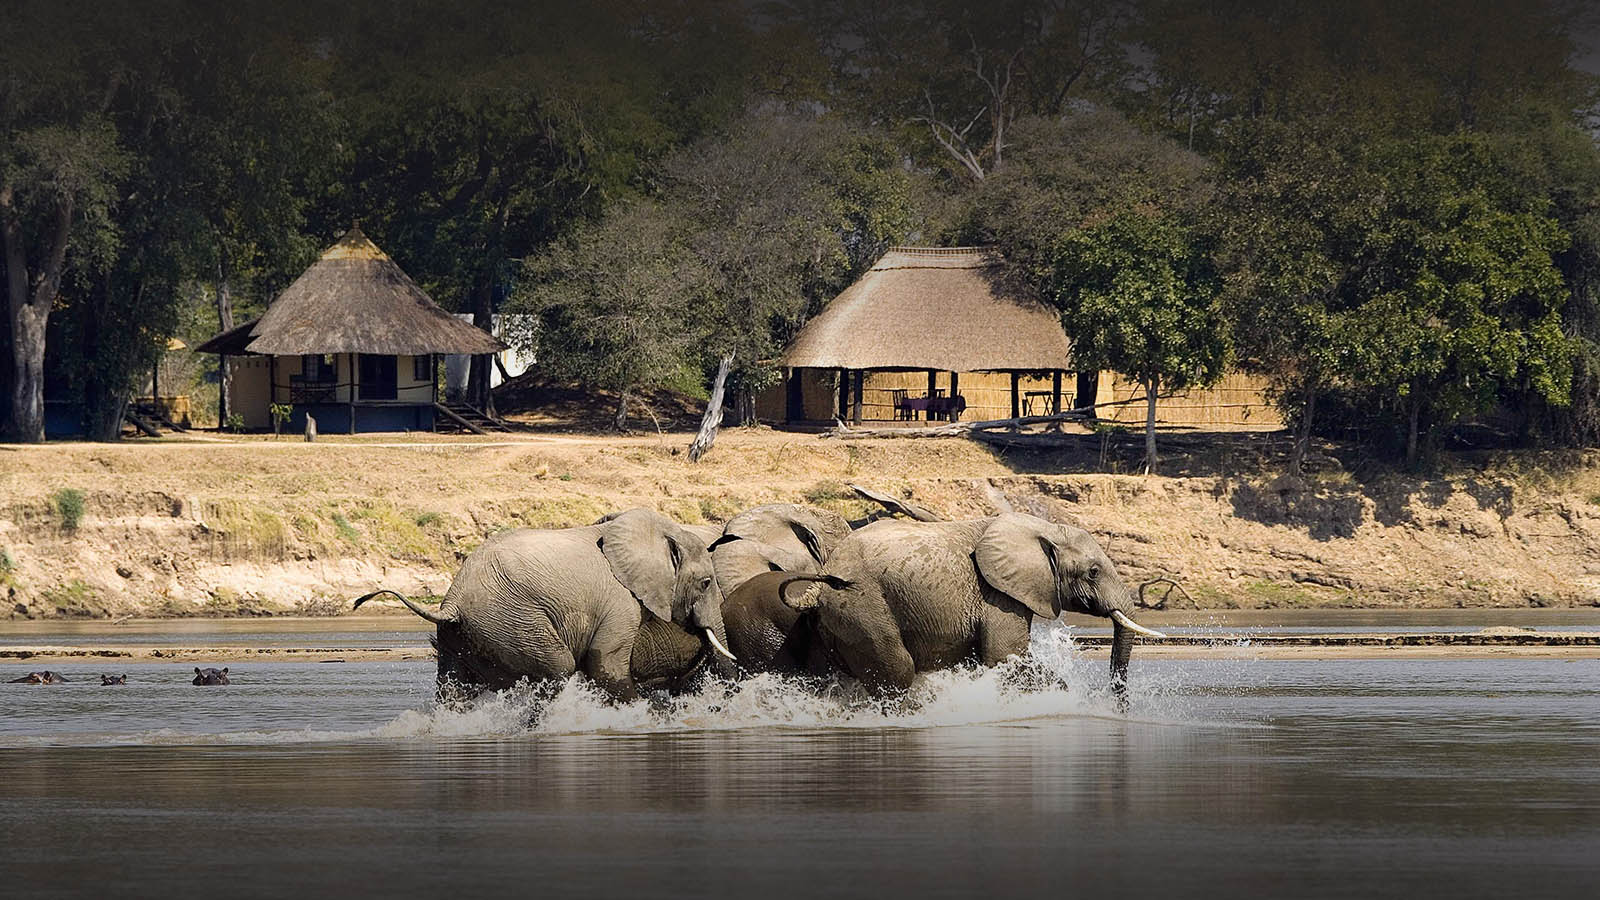 rps-green-season-walk-zambia-in-style-safari-packages-tours-nsefu-elephants